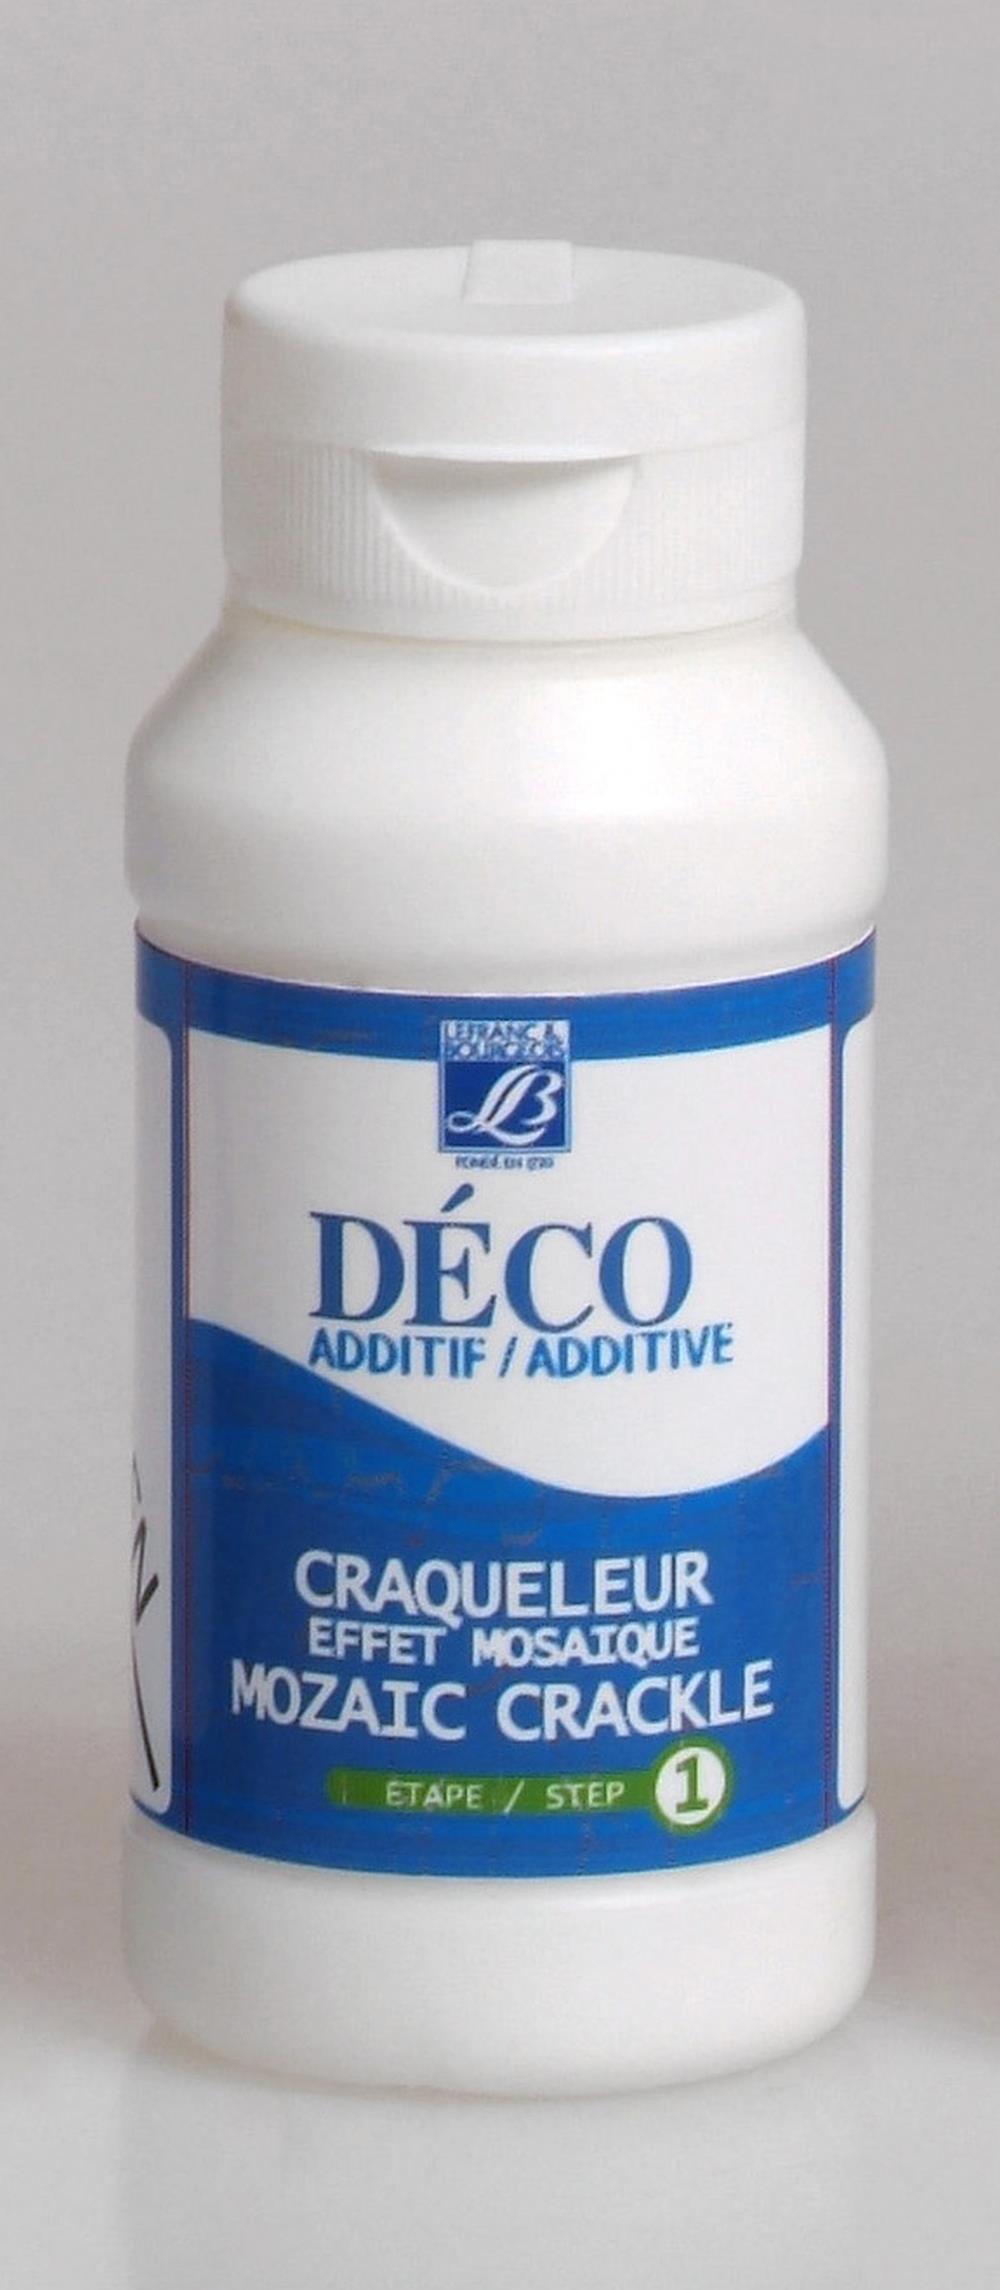 Hobbymedium L&B Deco Mosaik-krackelering steg 1, 120 ml